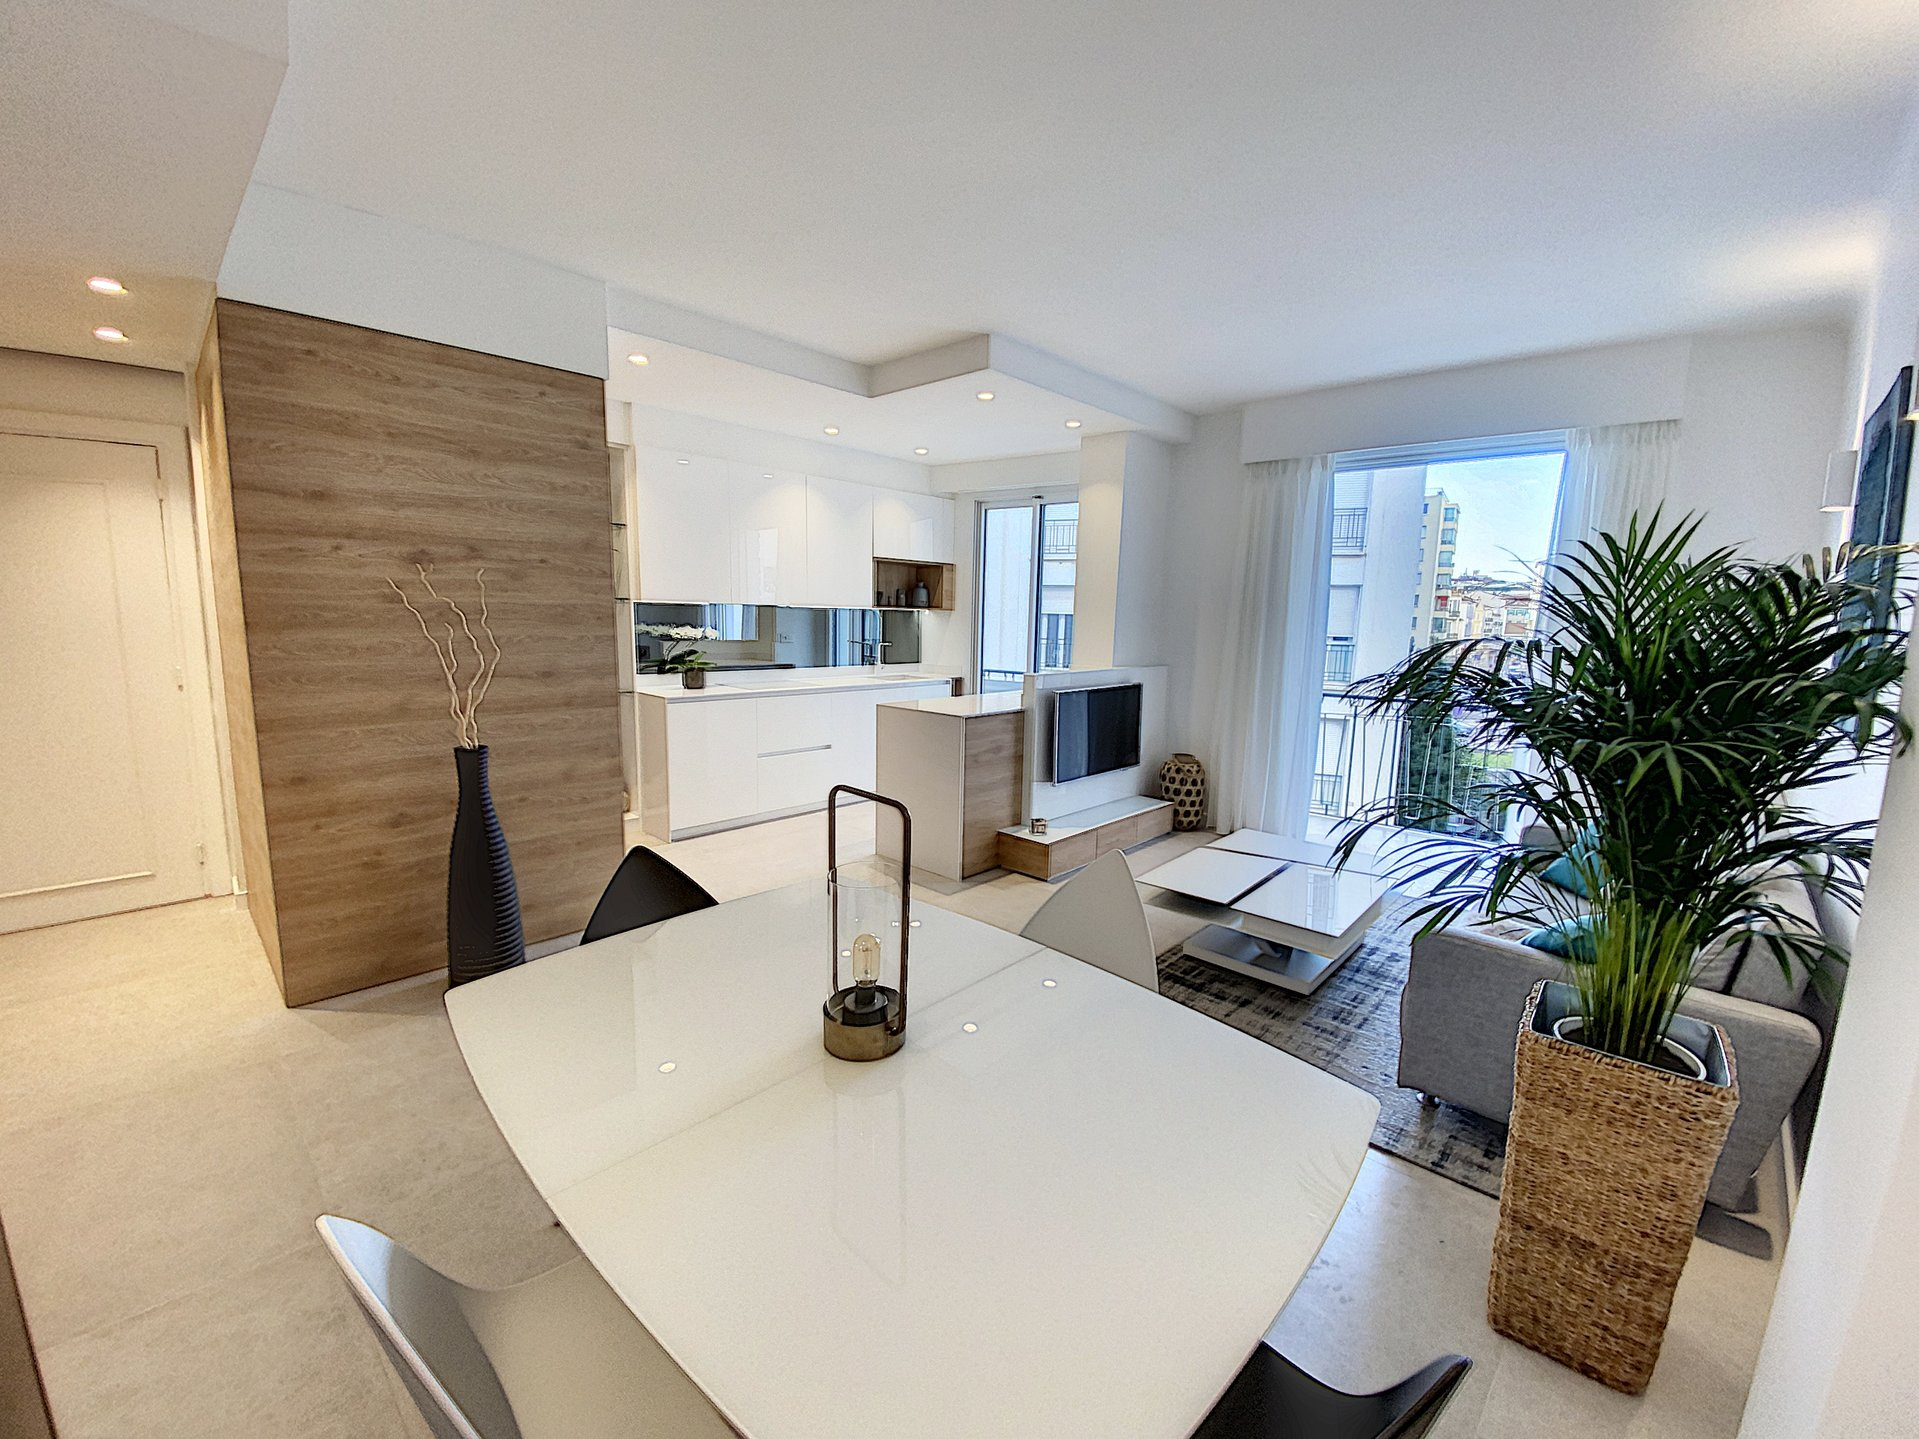 Cannes Armenonville - 3 room 64 sq.m Garage.